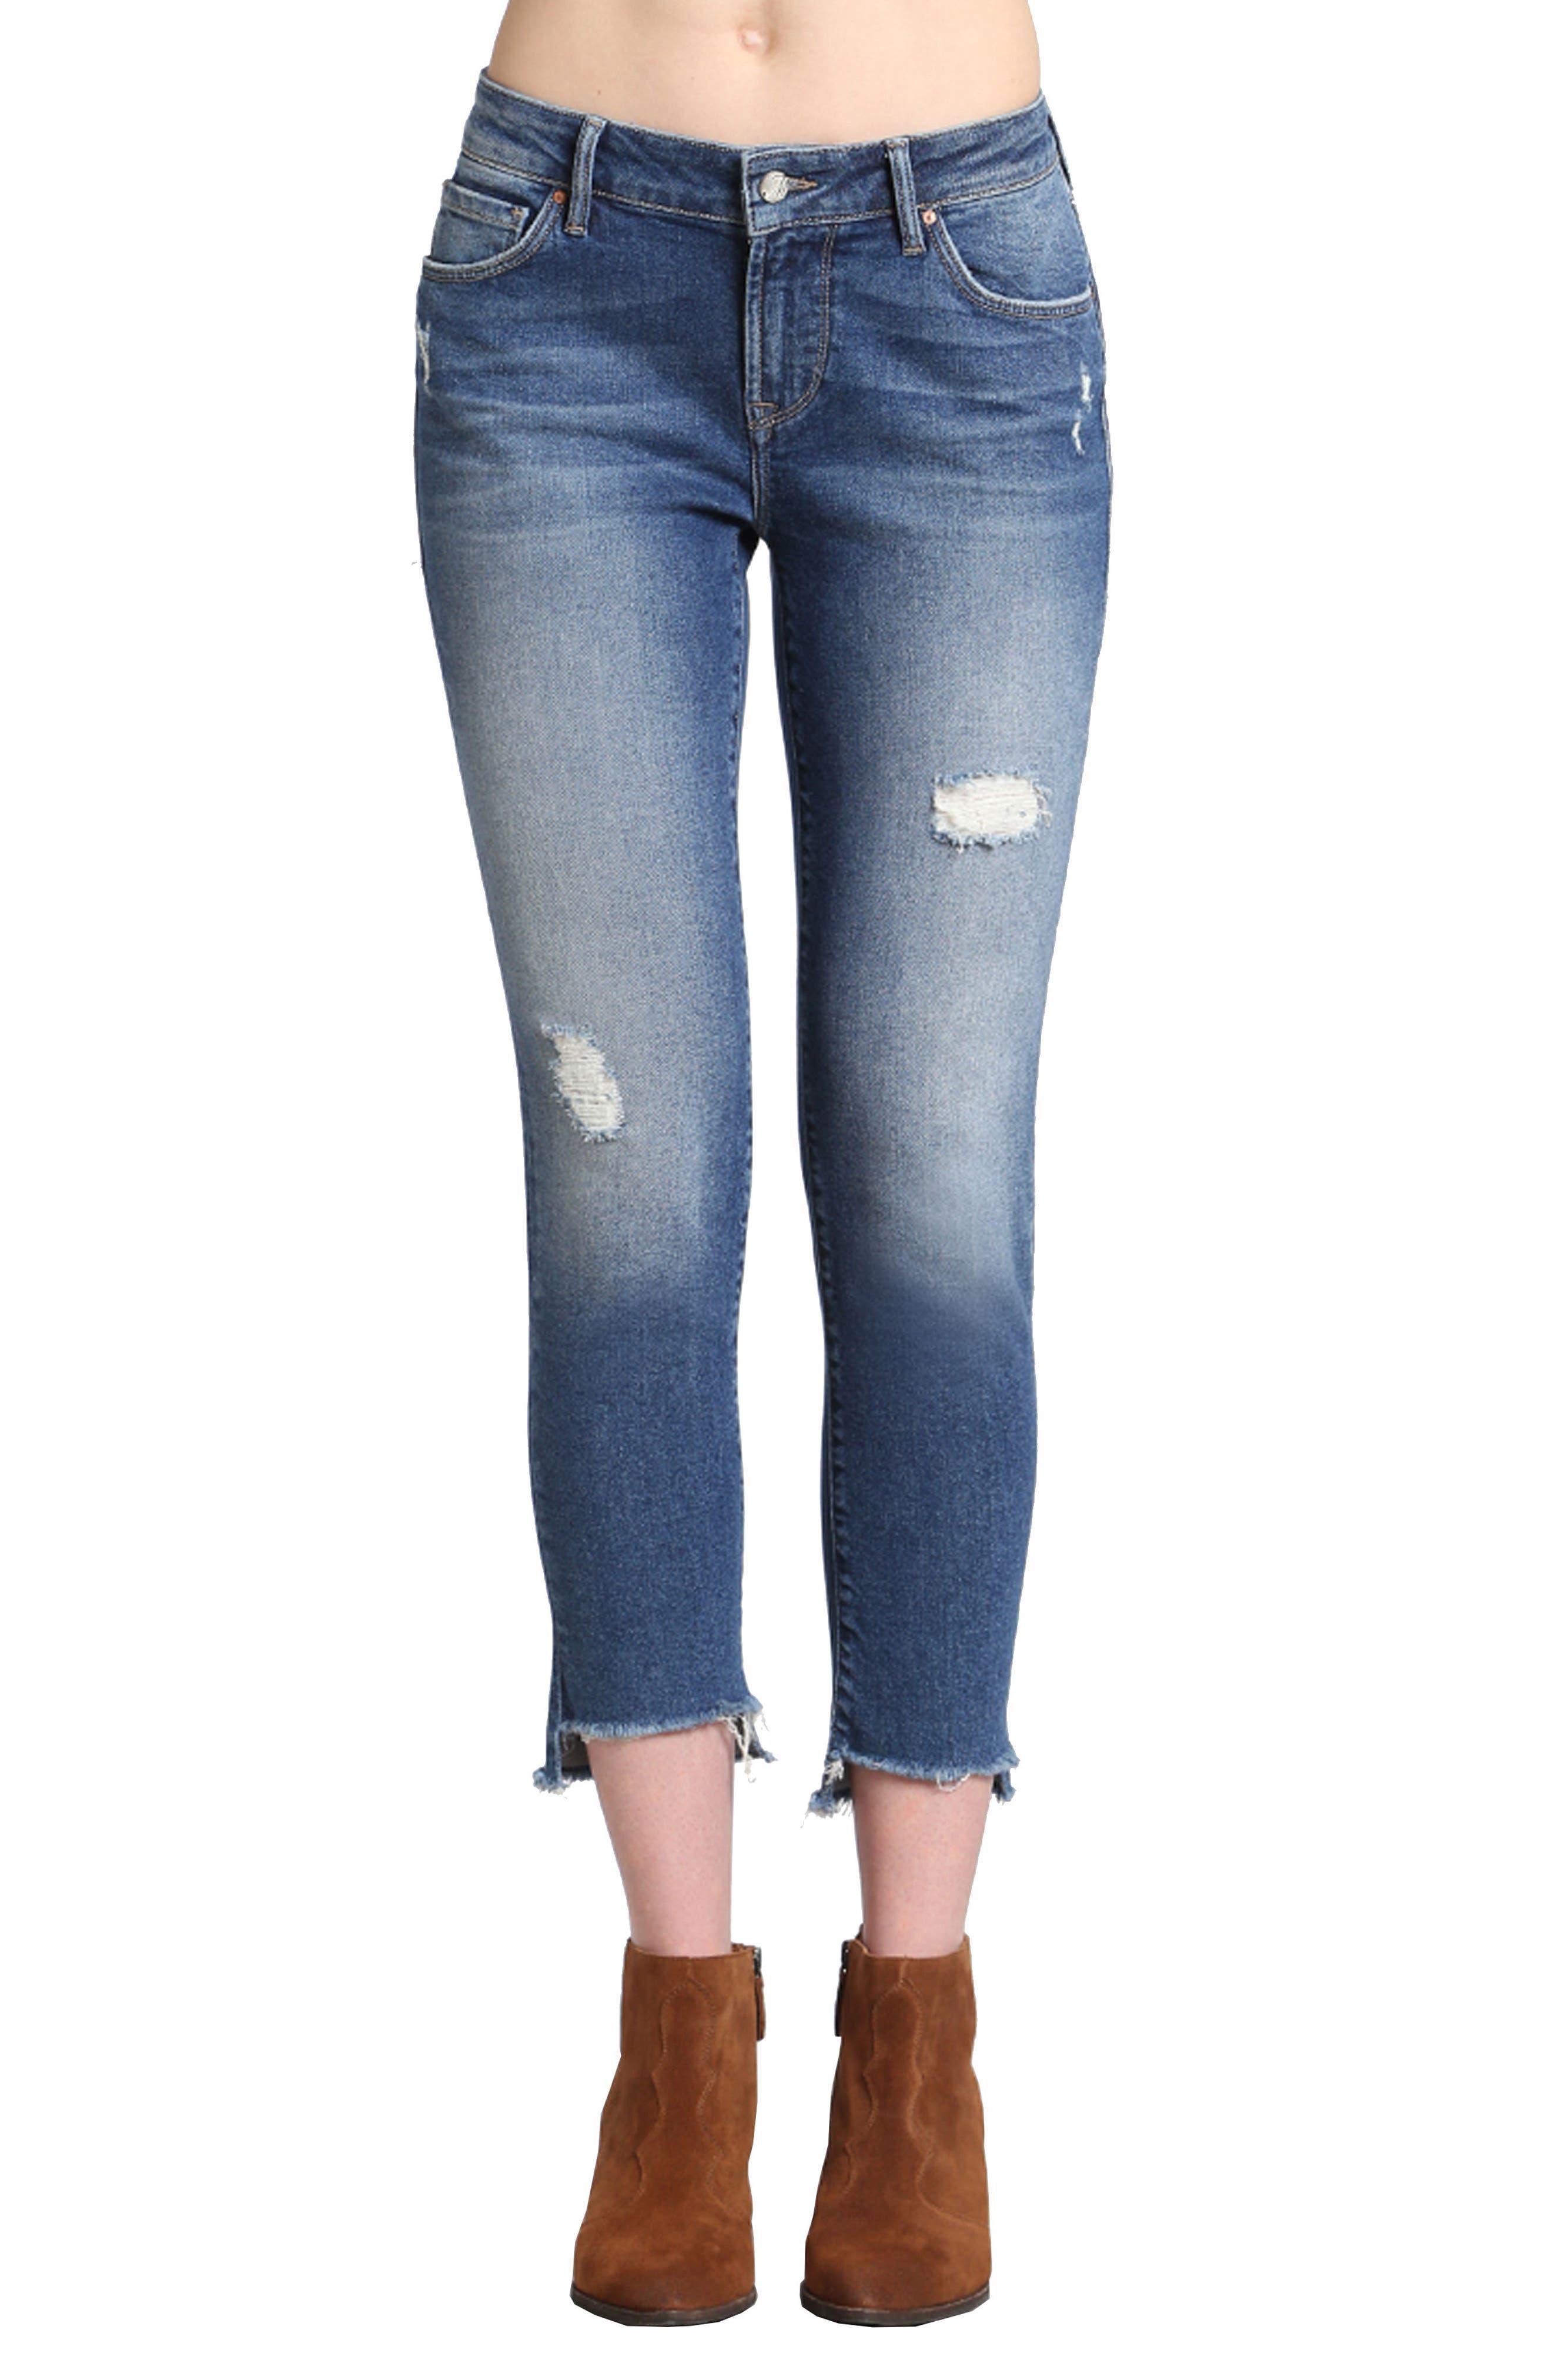 MAVI JEANS Ada Distressed Boyfriend Jeans